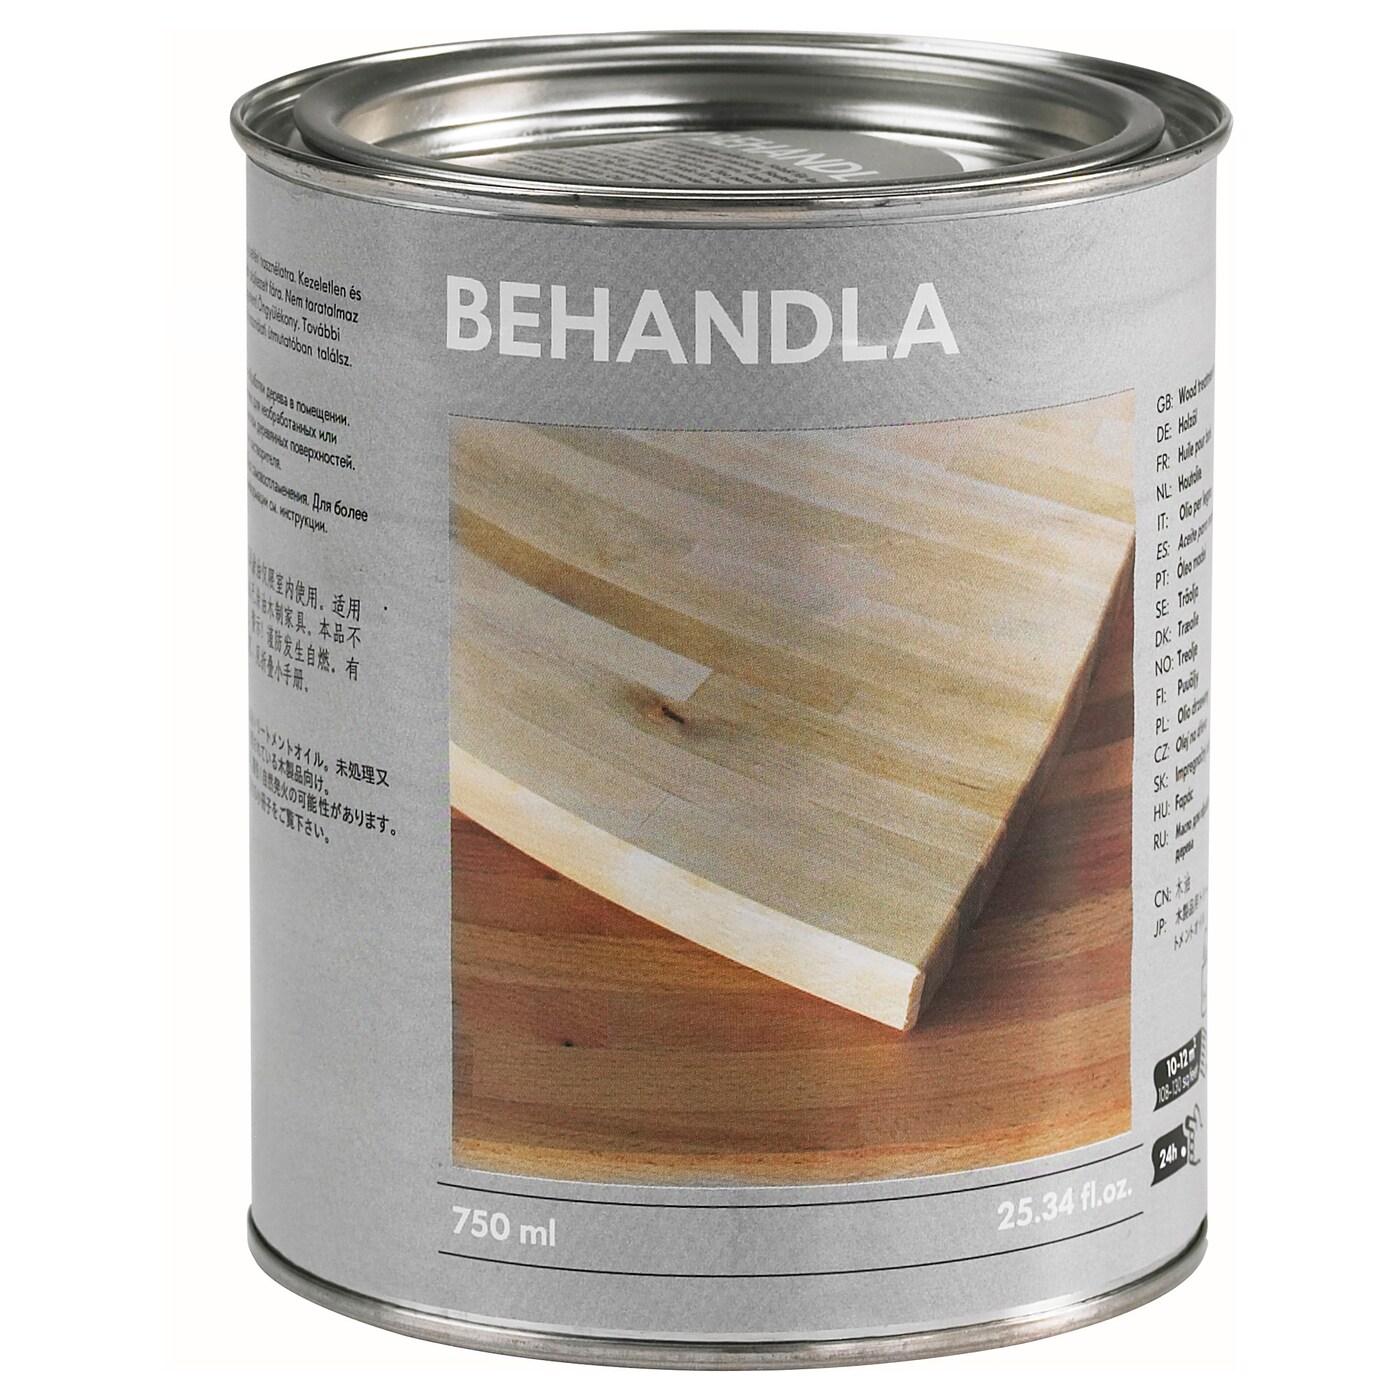 Ikea Lasur behandla lasur weiß ikea